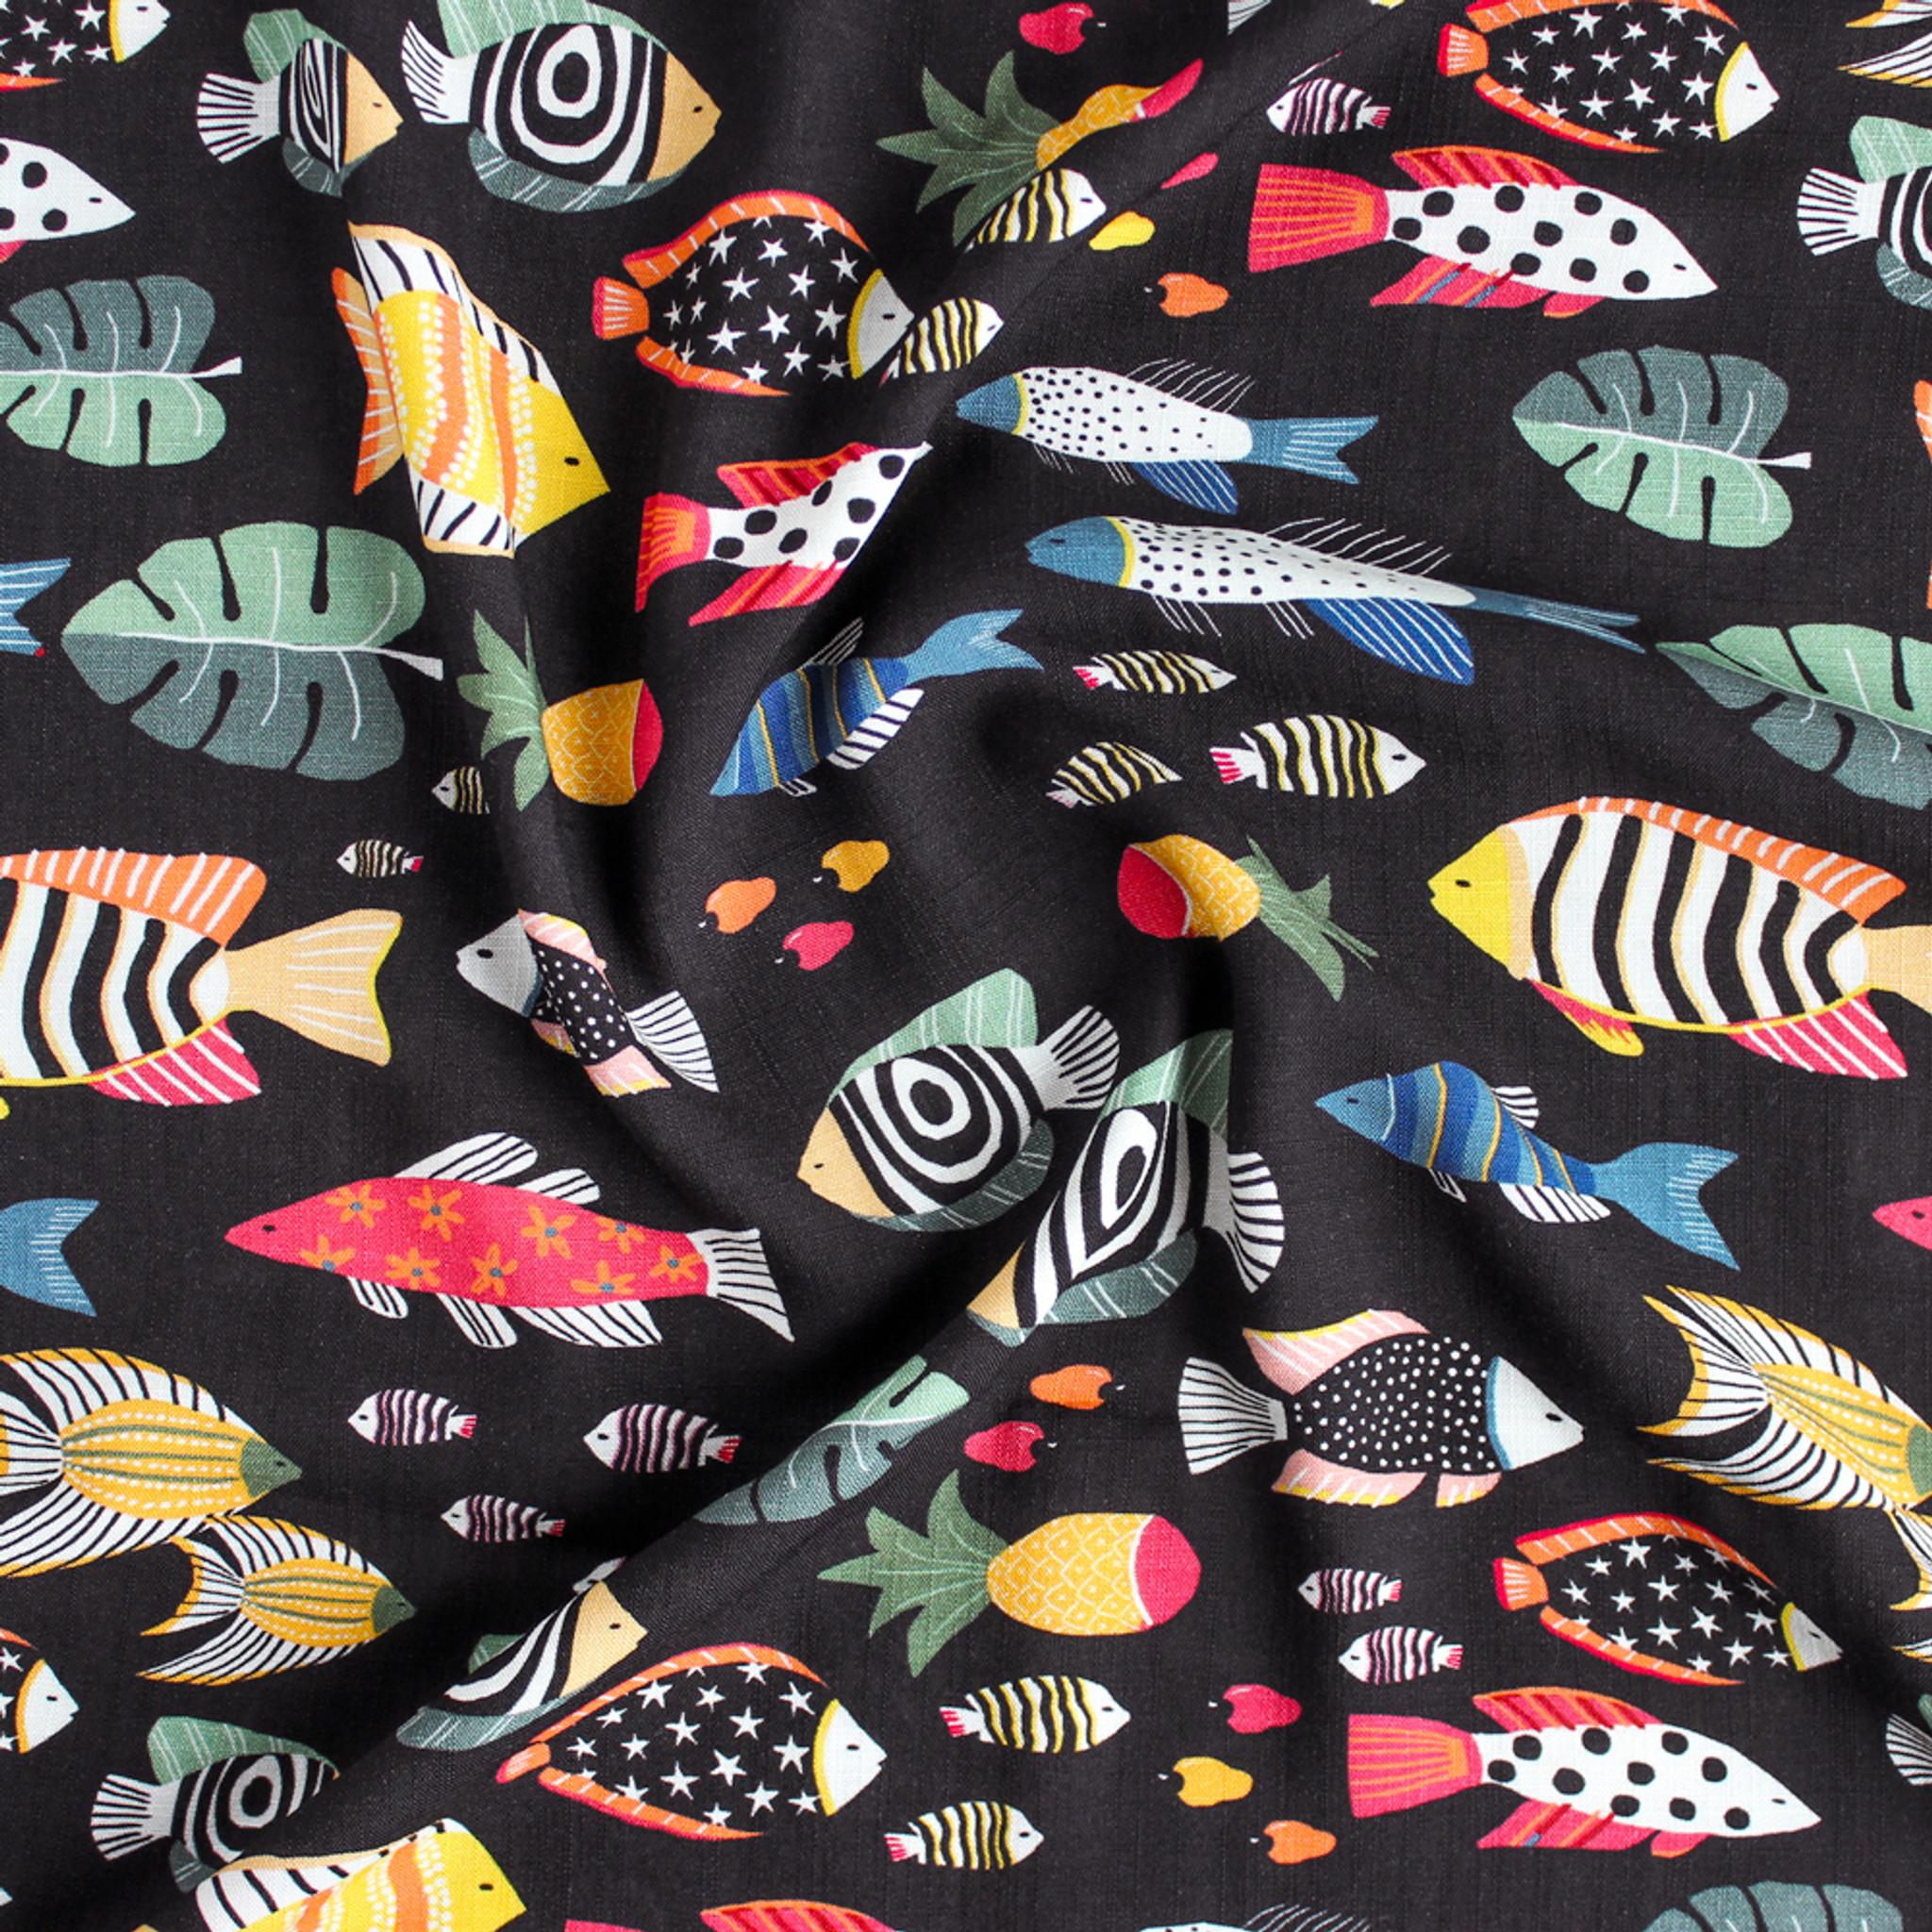 1fd8406c700 Fish Print Rayon Slub - Black/Multi - 1/2 meter